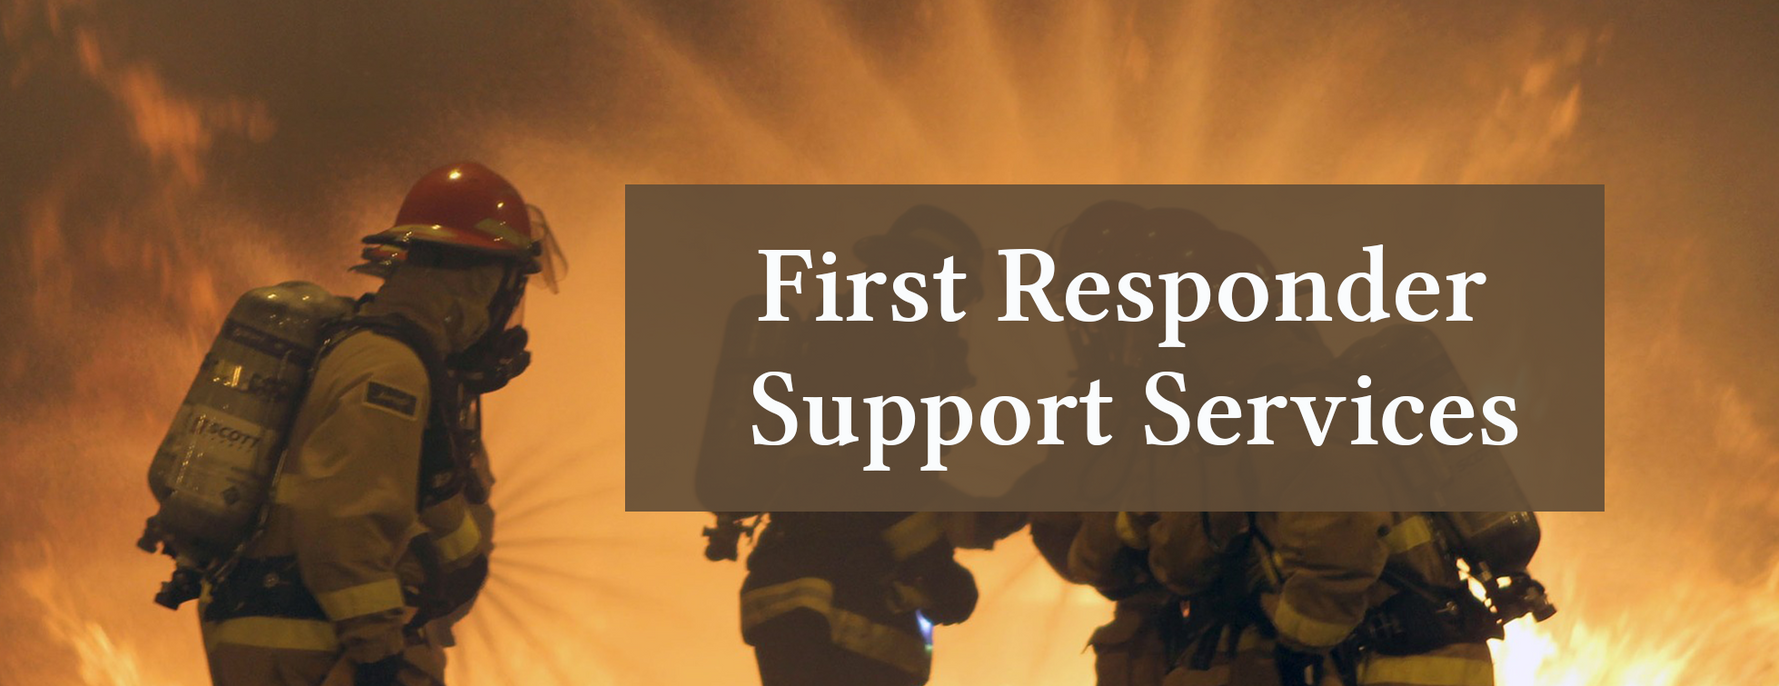 First Responder Services